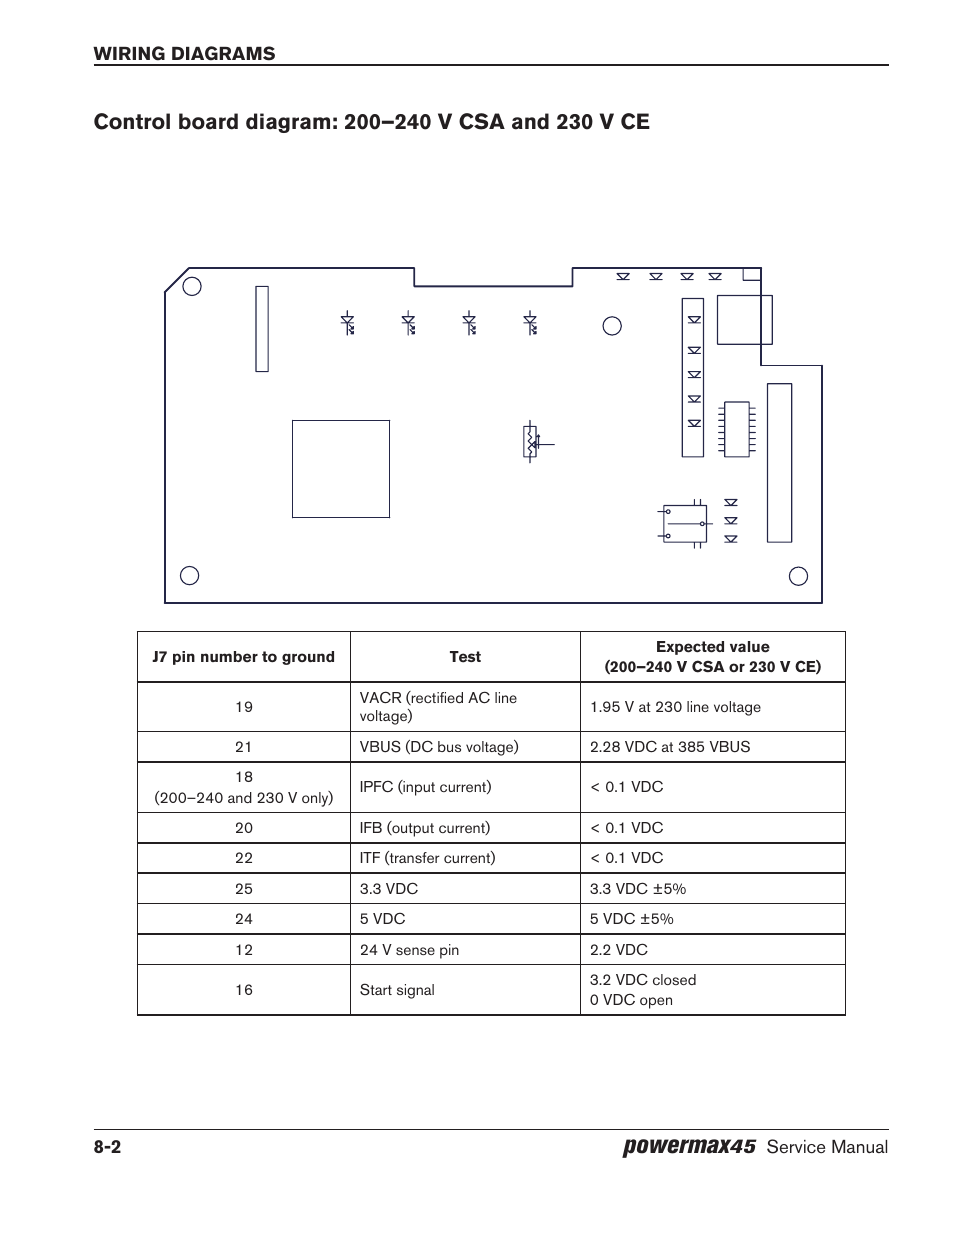 Control Board Diagram 200240 V Csa And 230 Ce Powermax Wiring Volt Schematic